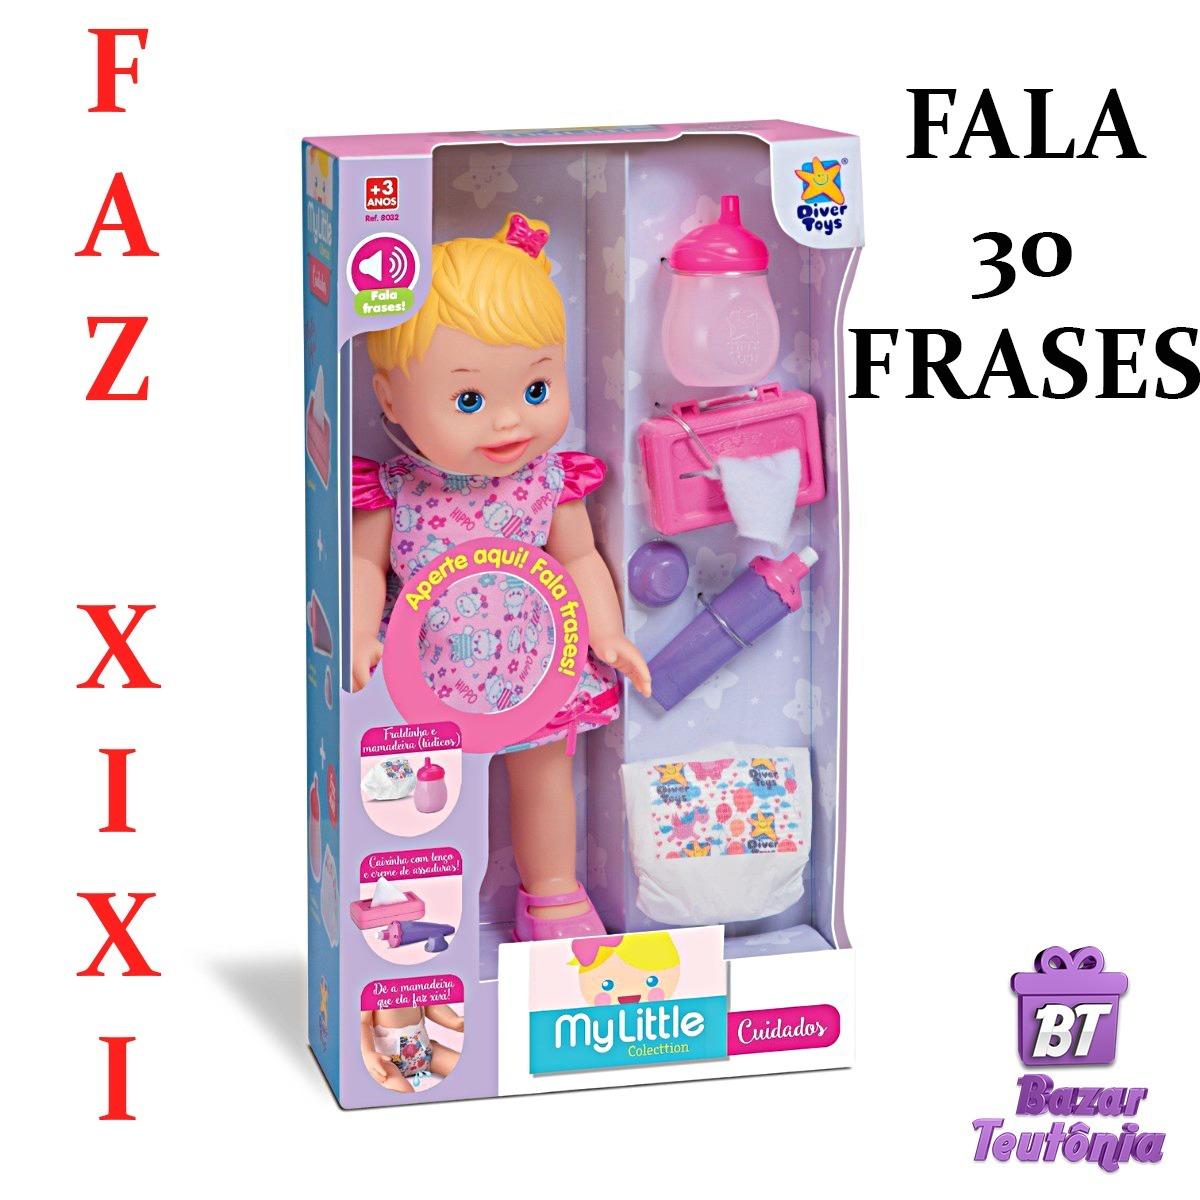 Boneca My Baby Little Faz Xixi Com Fralda Fala 30 Frases